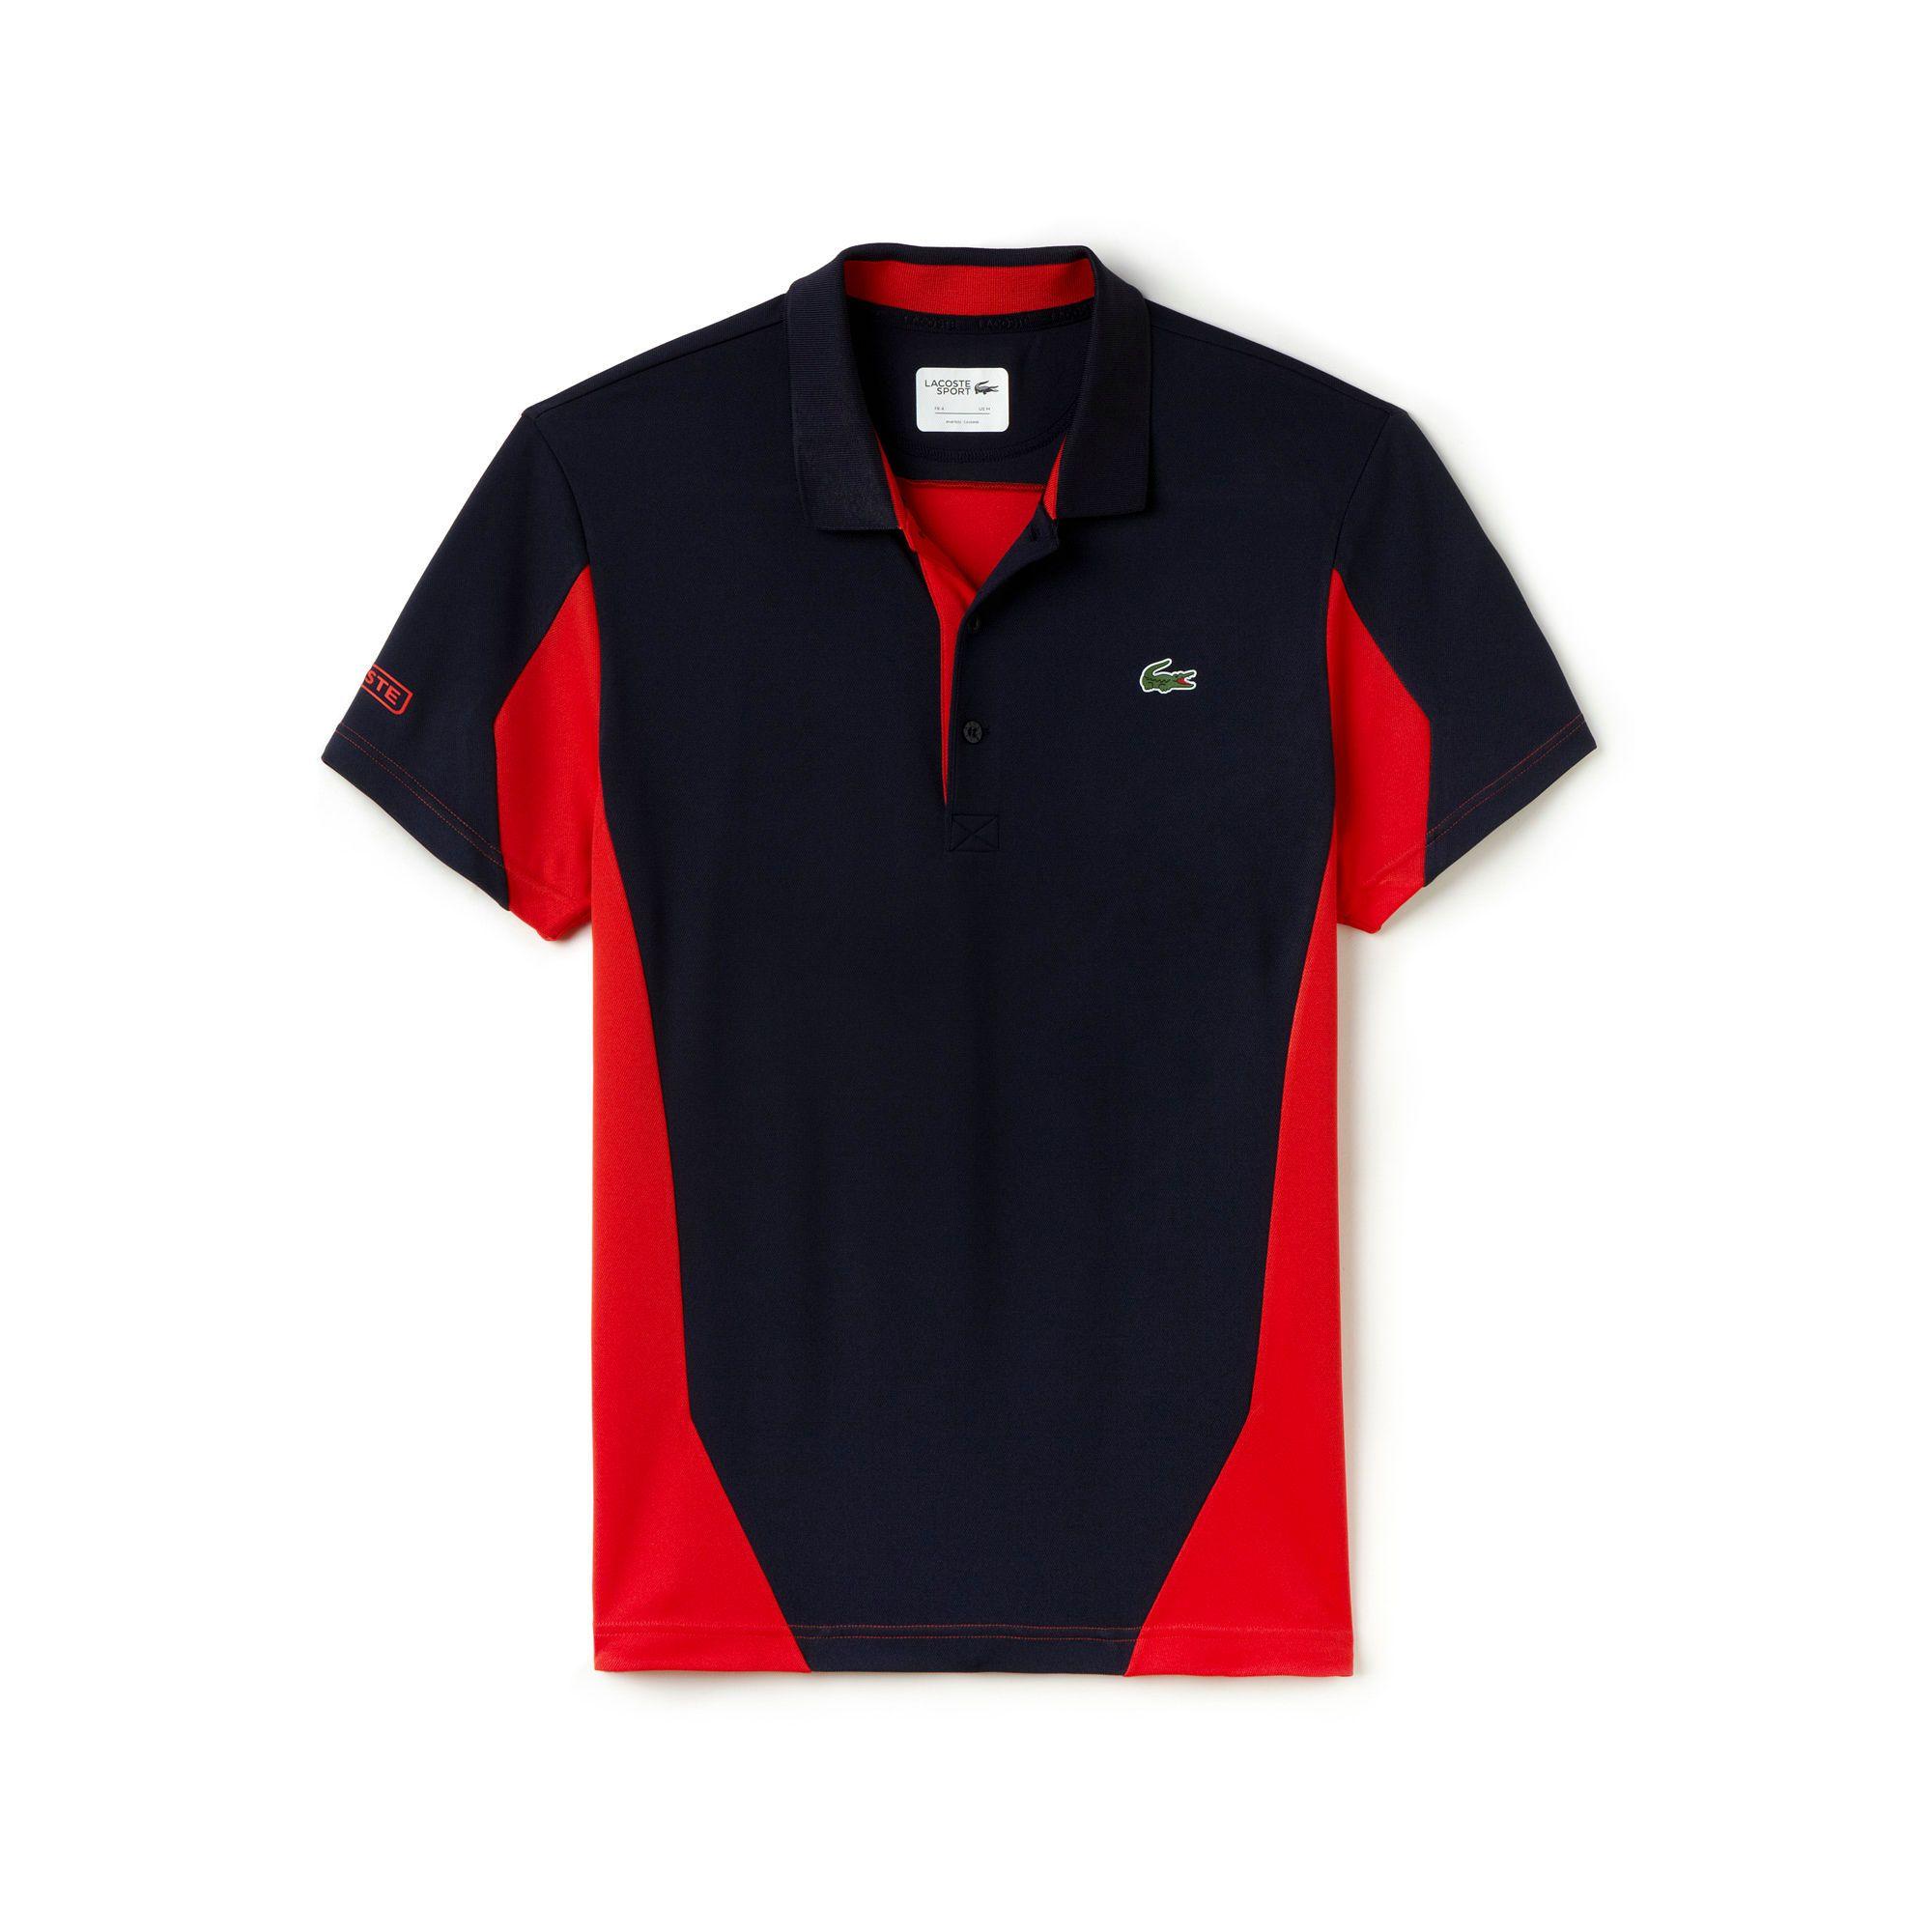 Men S Sport Ultra Dry Color Block Tennis T Shirt Lacoste Polo Shirt Design Polo Tee Shirts Shirts